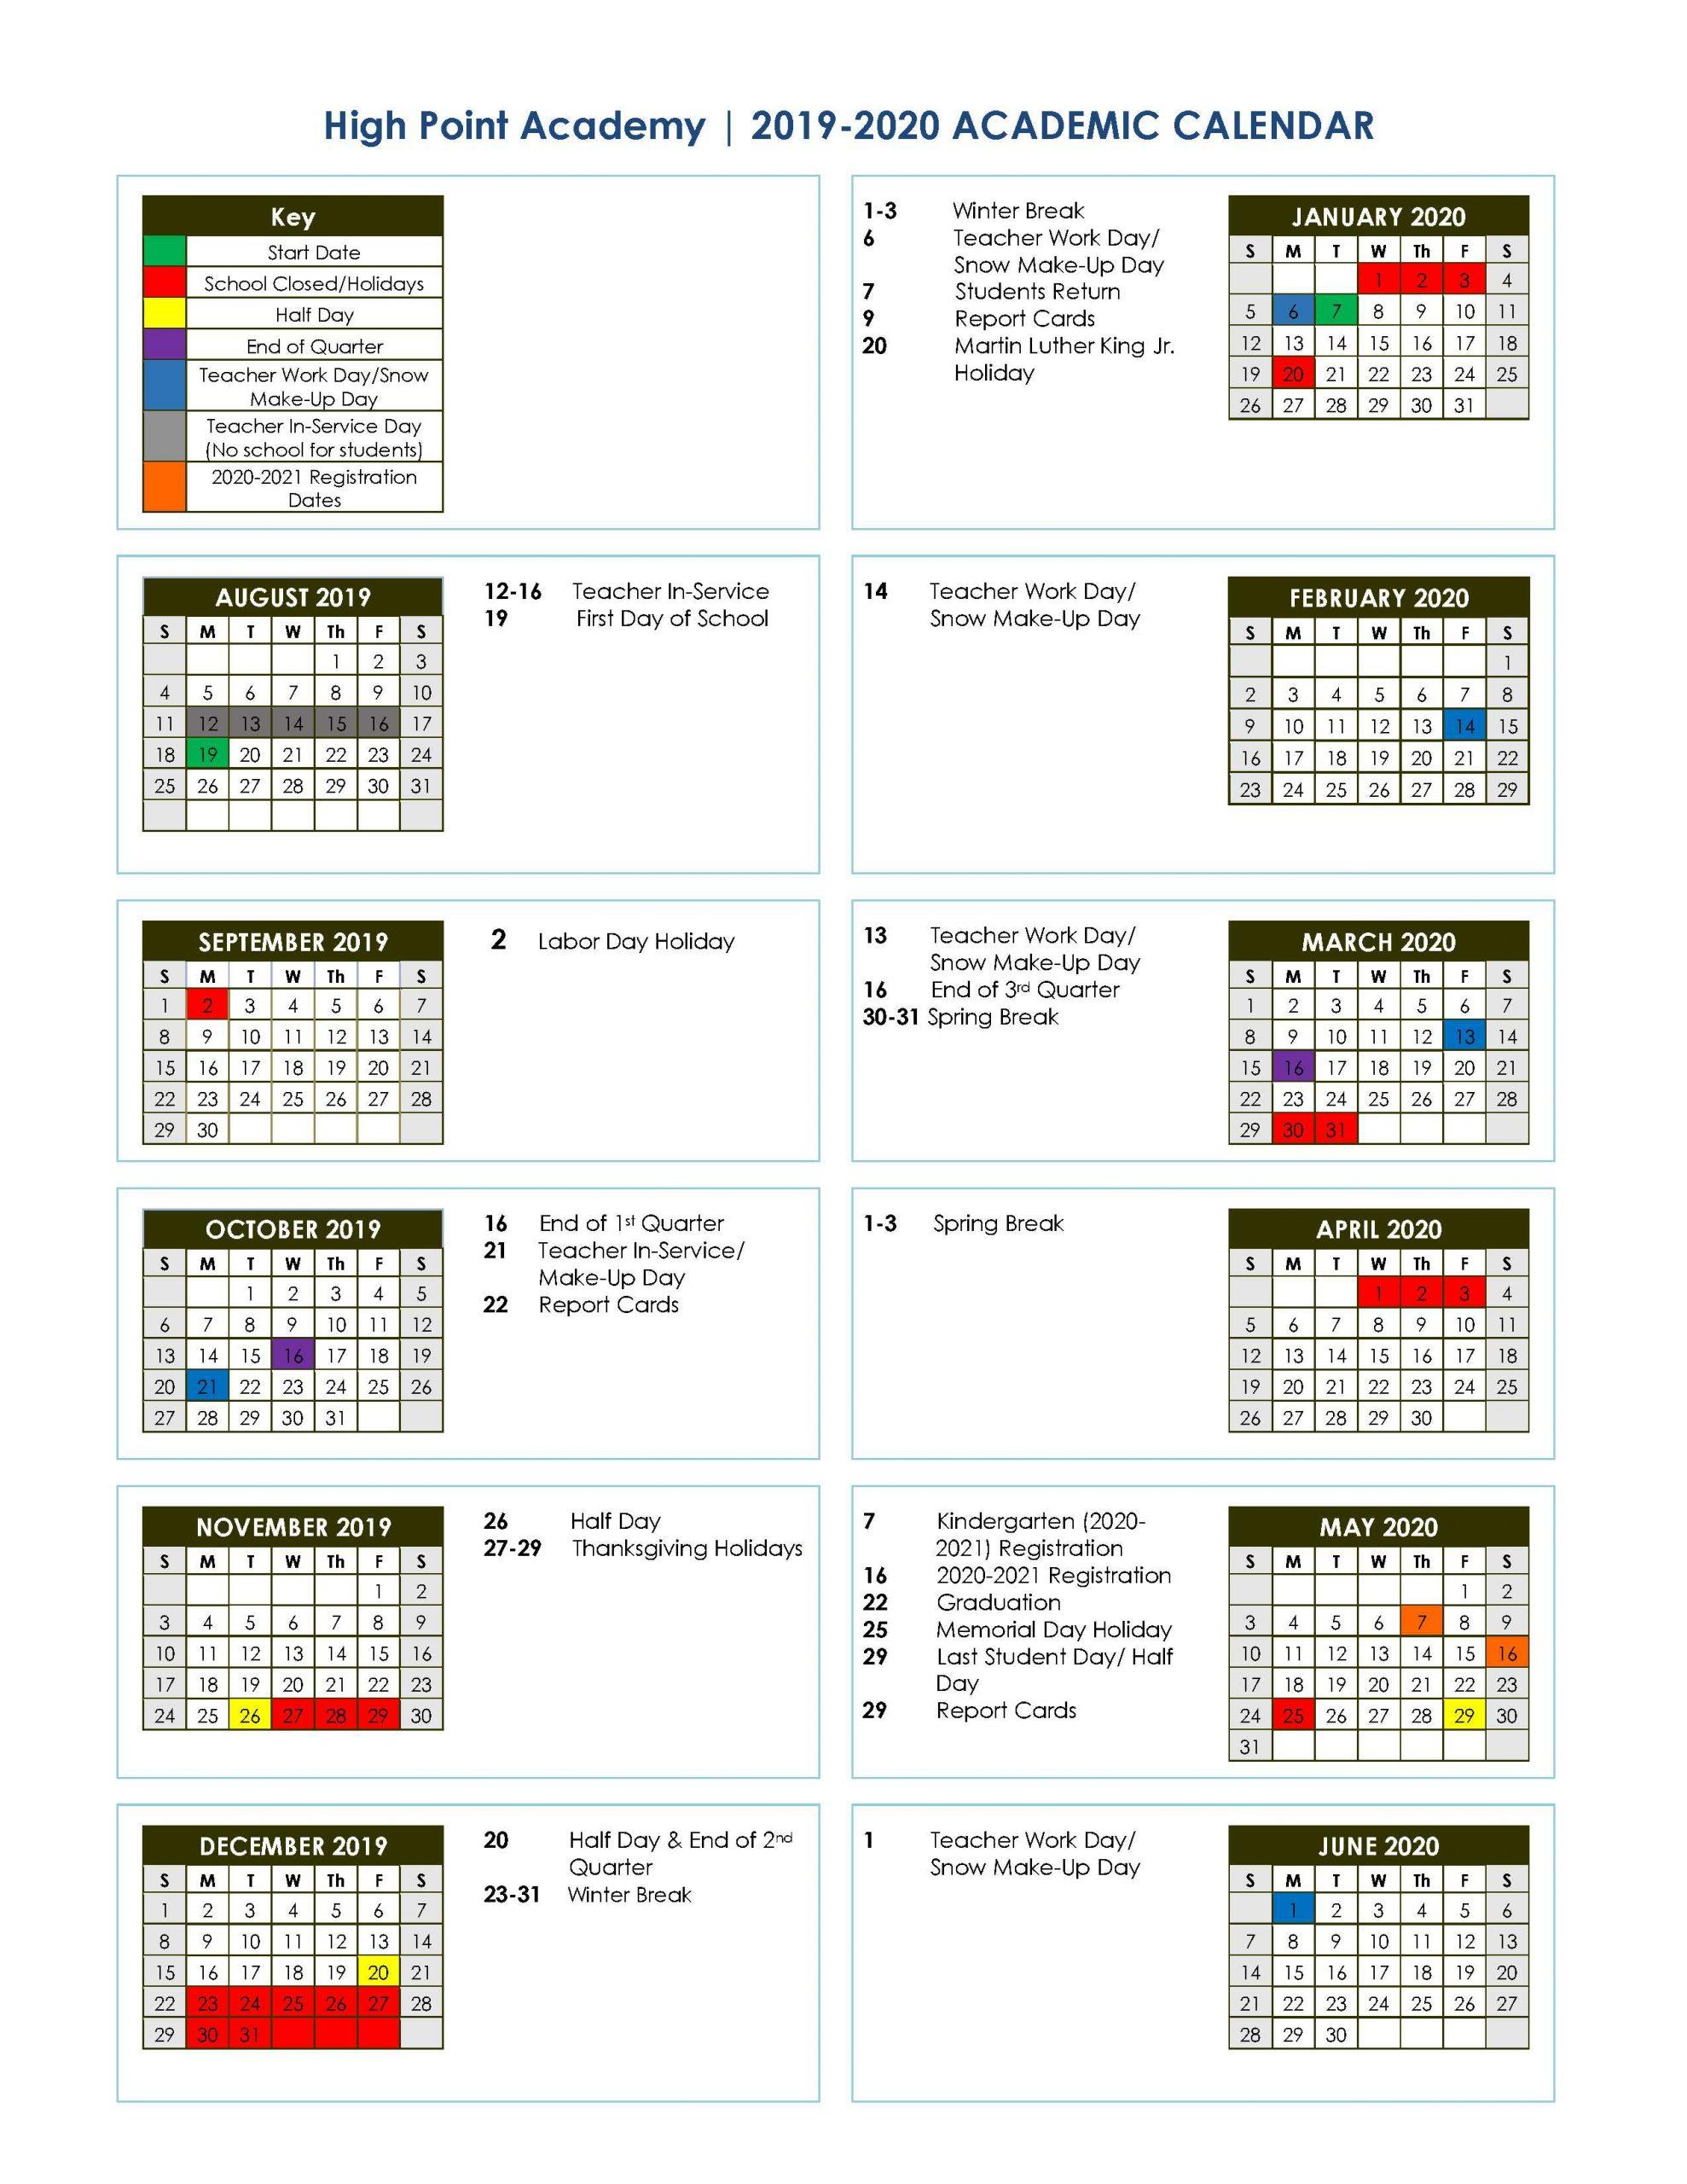 Corinth Ms School District 2019 2020 Academic Calendar Intended For Franklin Central High School Calendar 2020